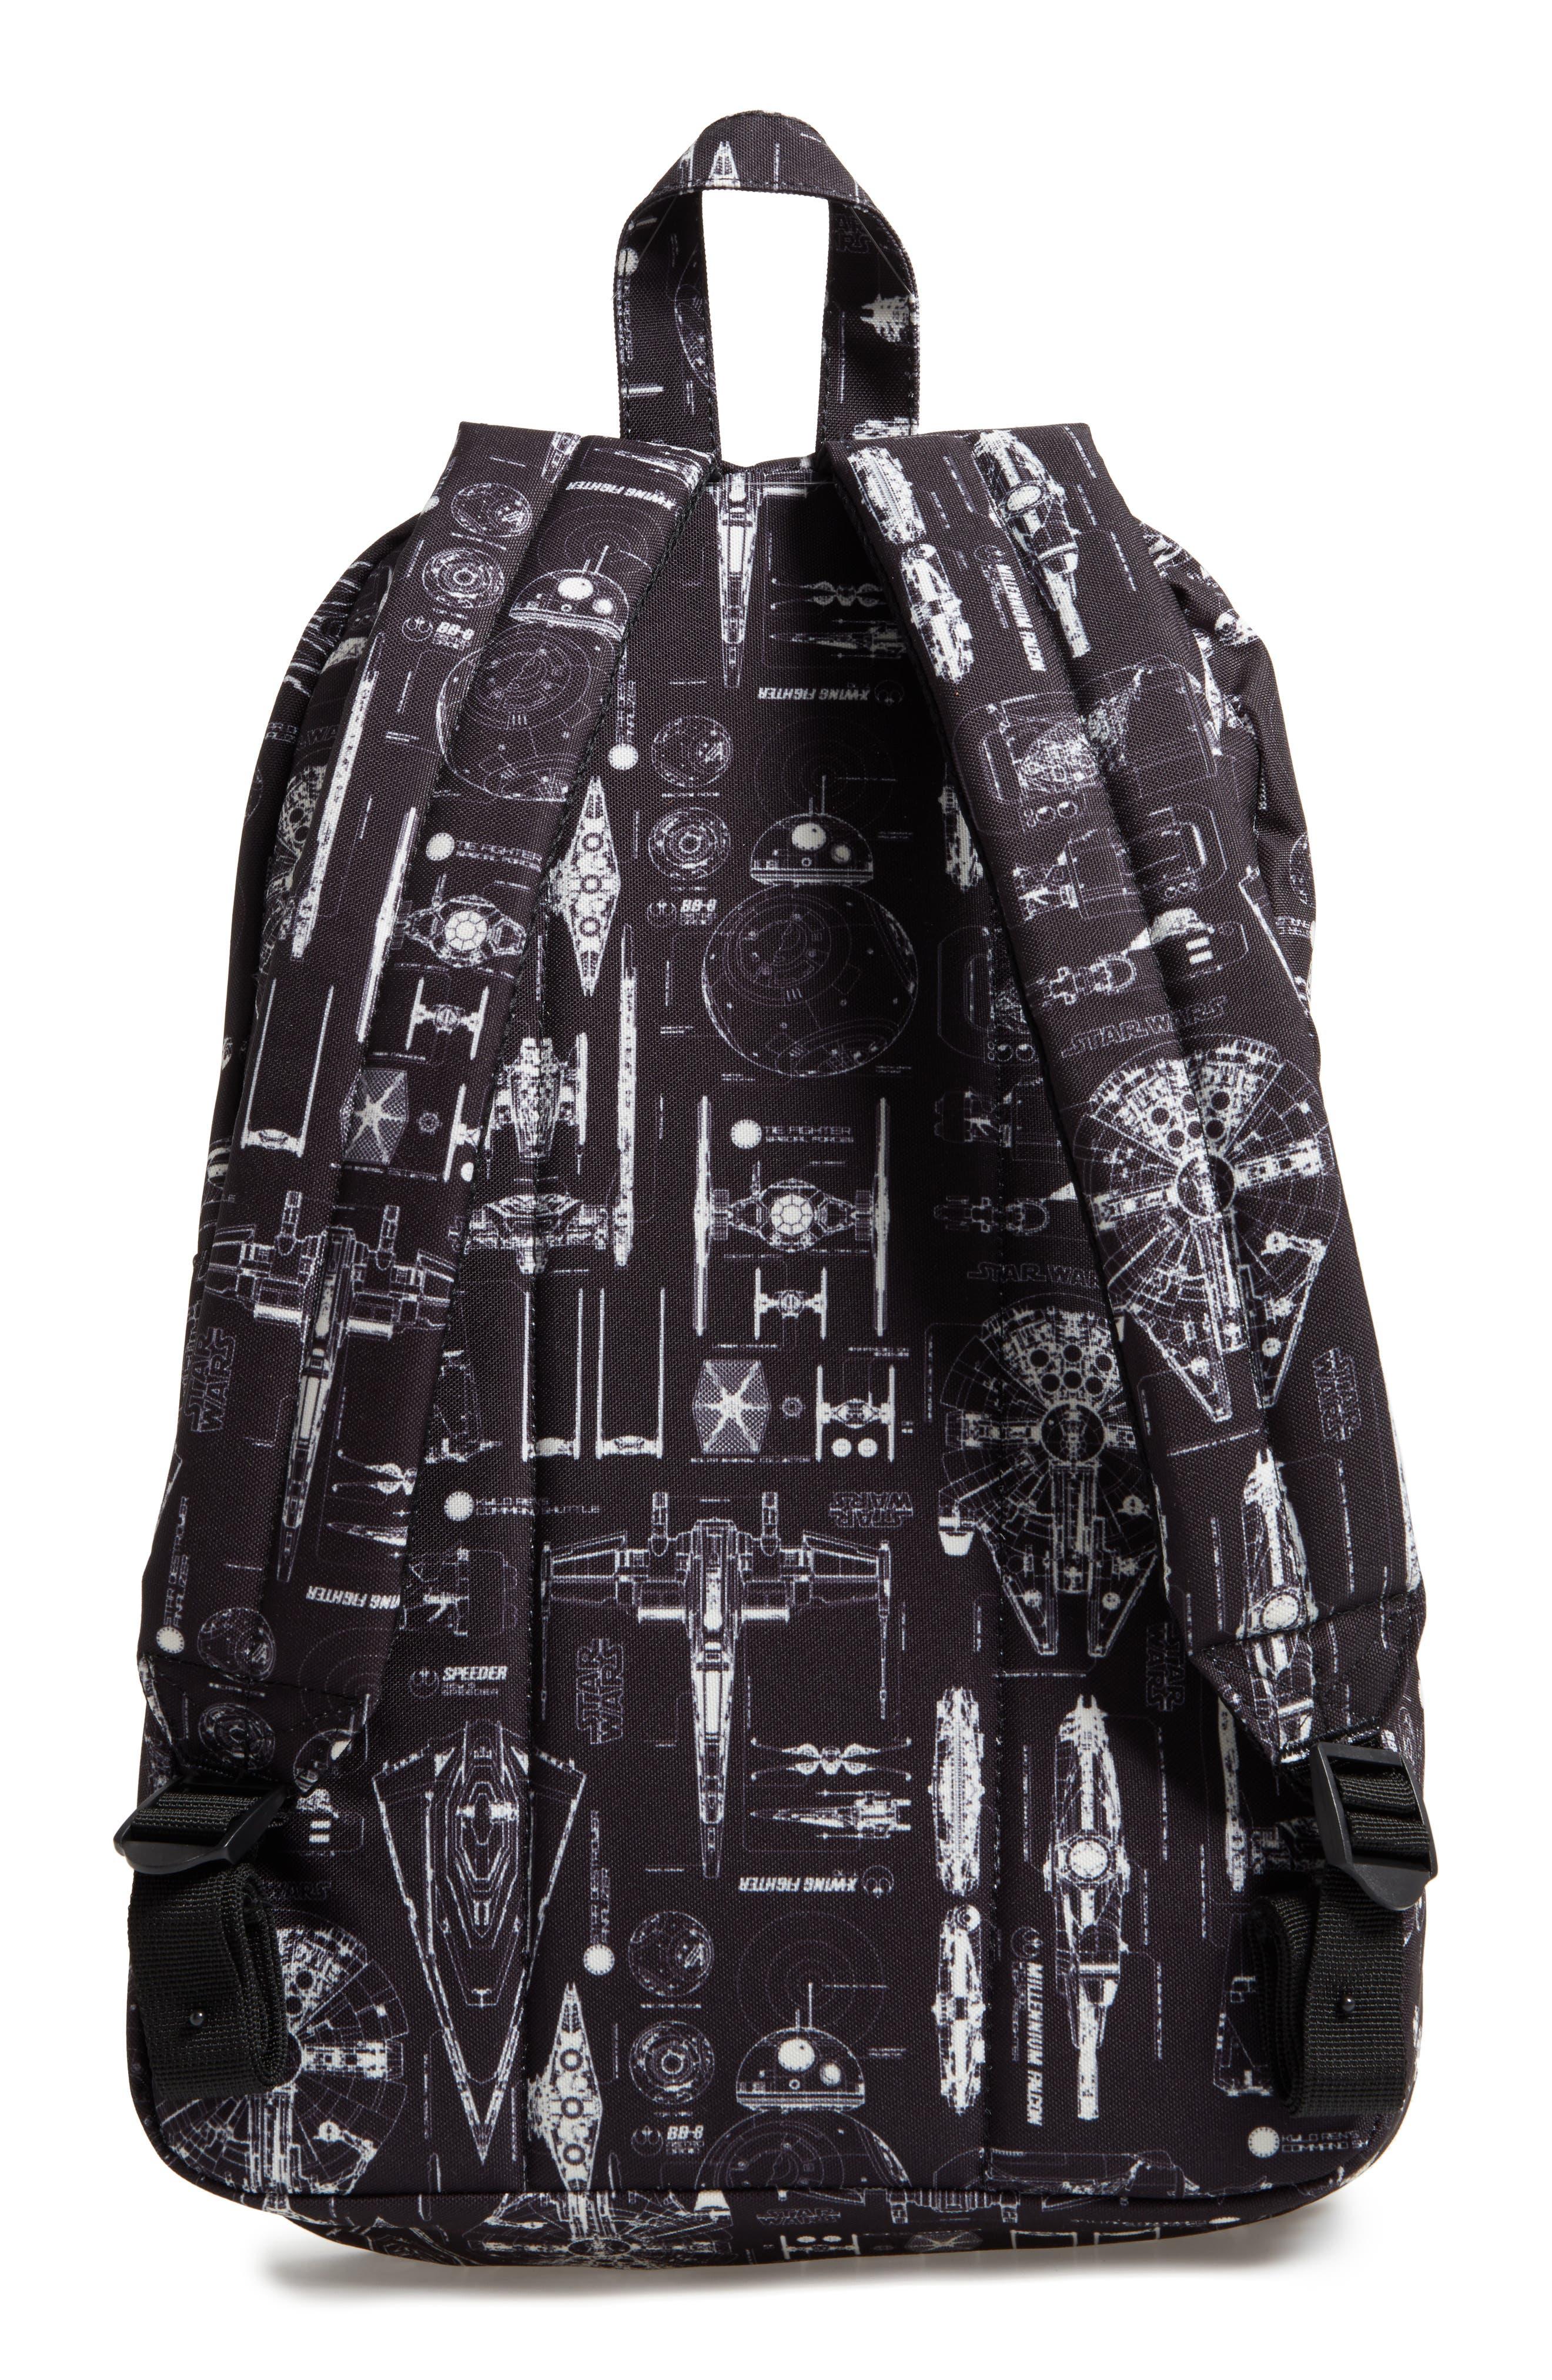 Star Wars<sup>™</sup> The Force Awakens Blueprint Backpack,                             Alternate thumbnail 2, color,                             Black